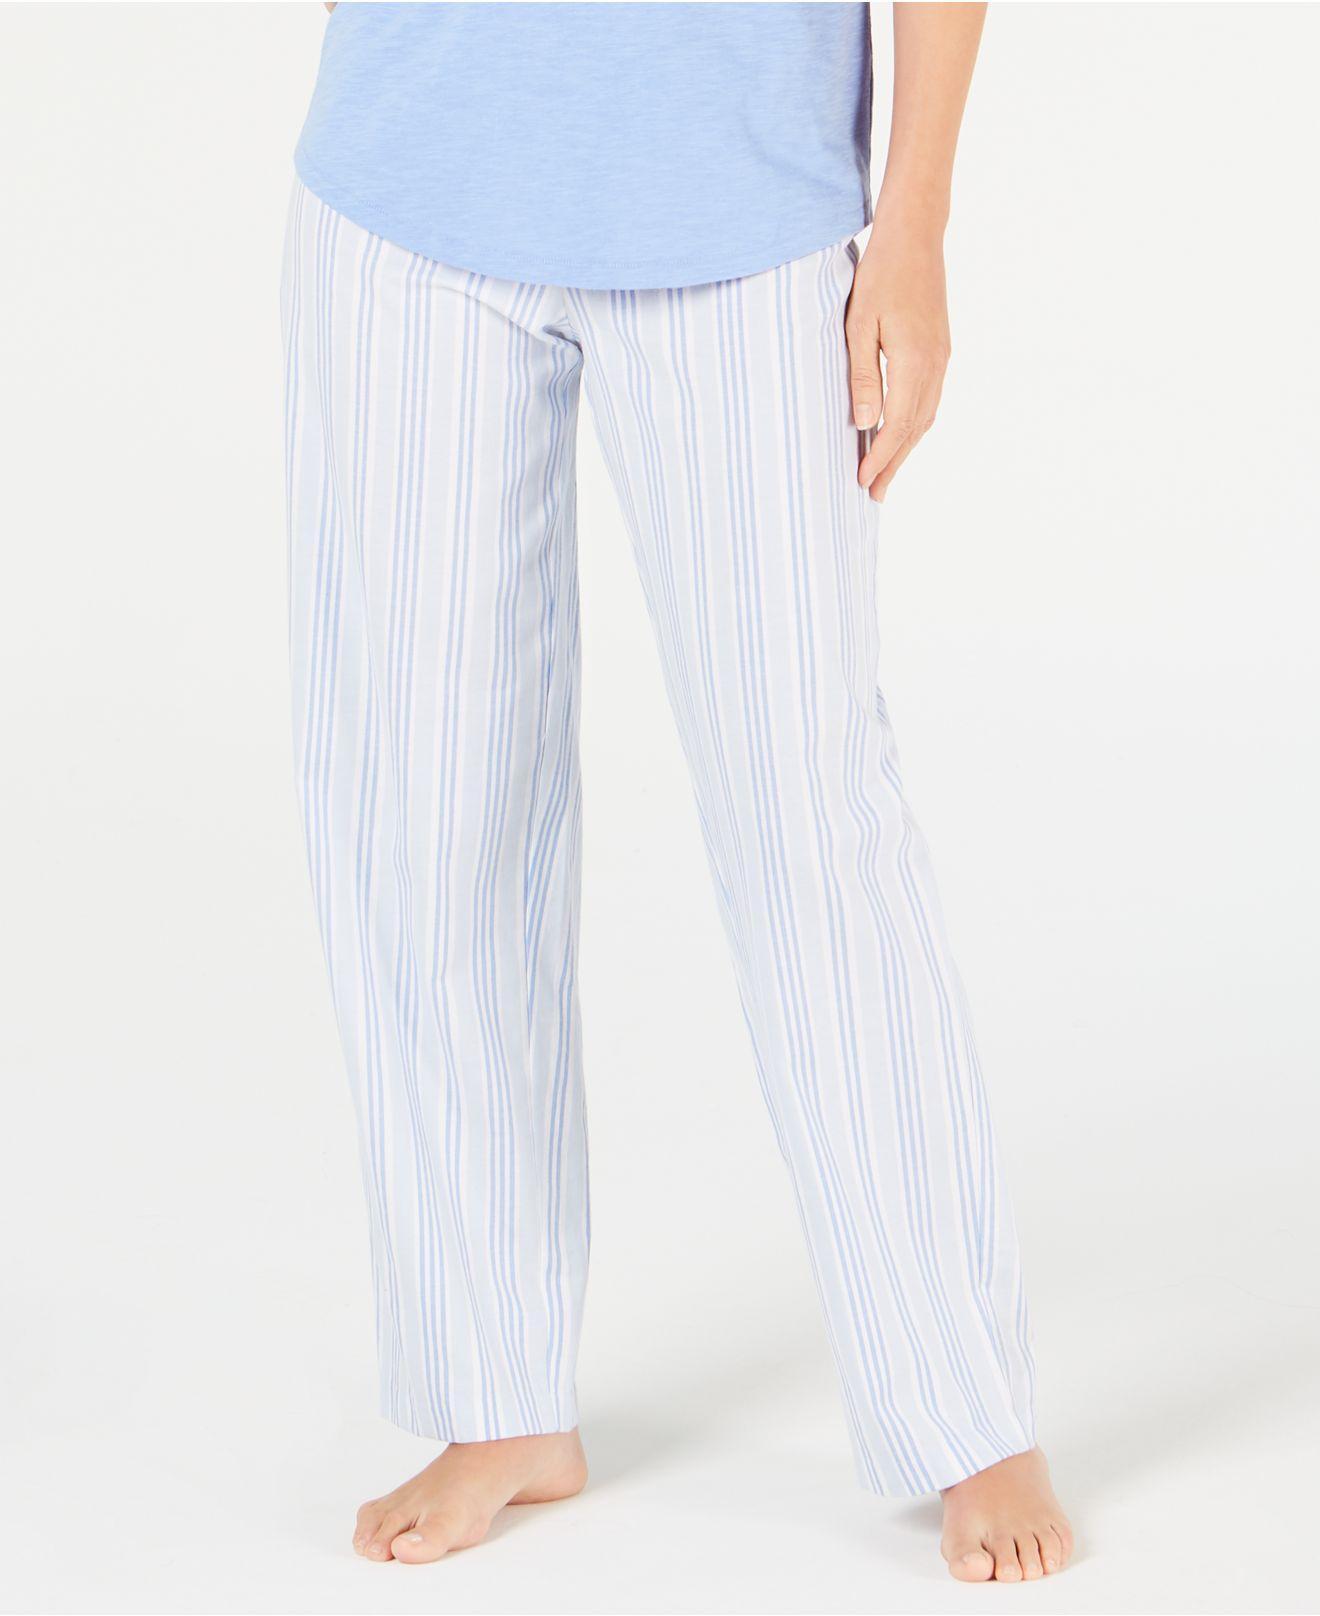 8cbe58256fda Charter Club. Women's Blue Stripe-print Woven Soft Cotton Pajama Pants ...